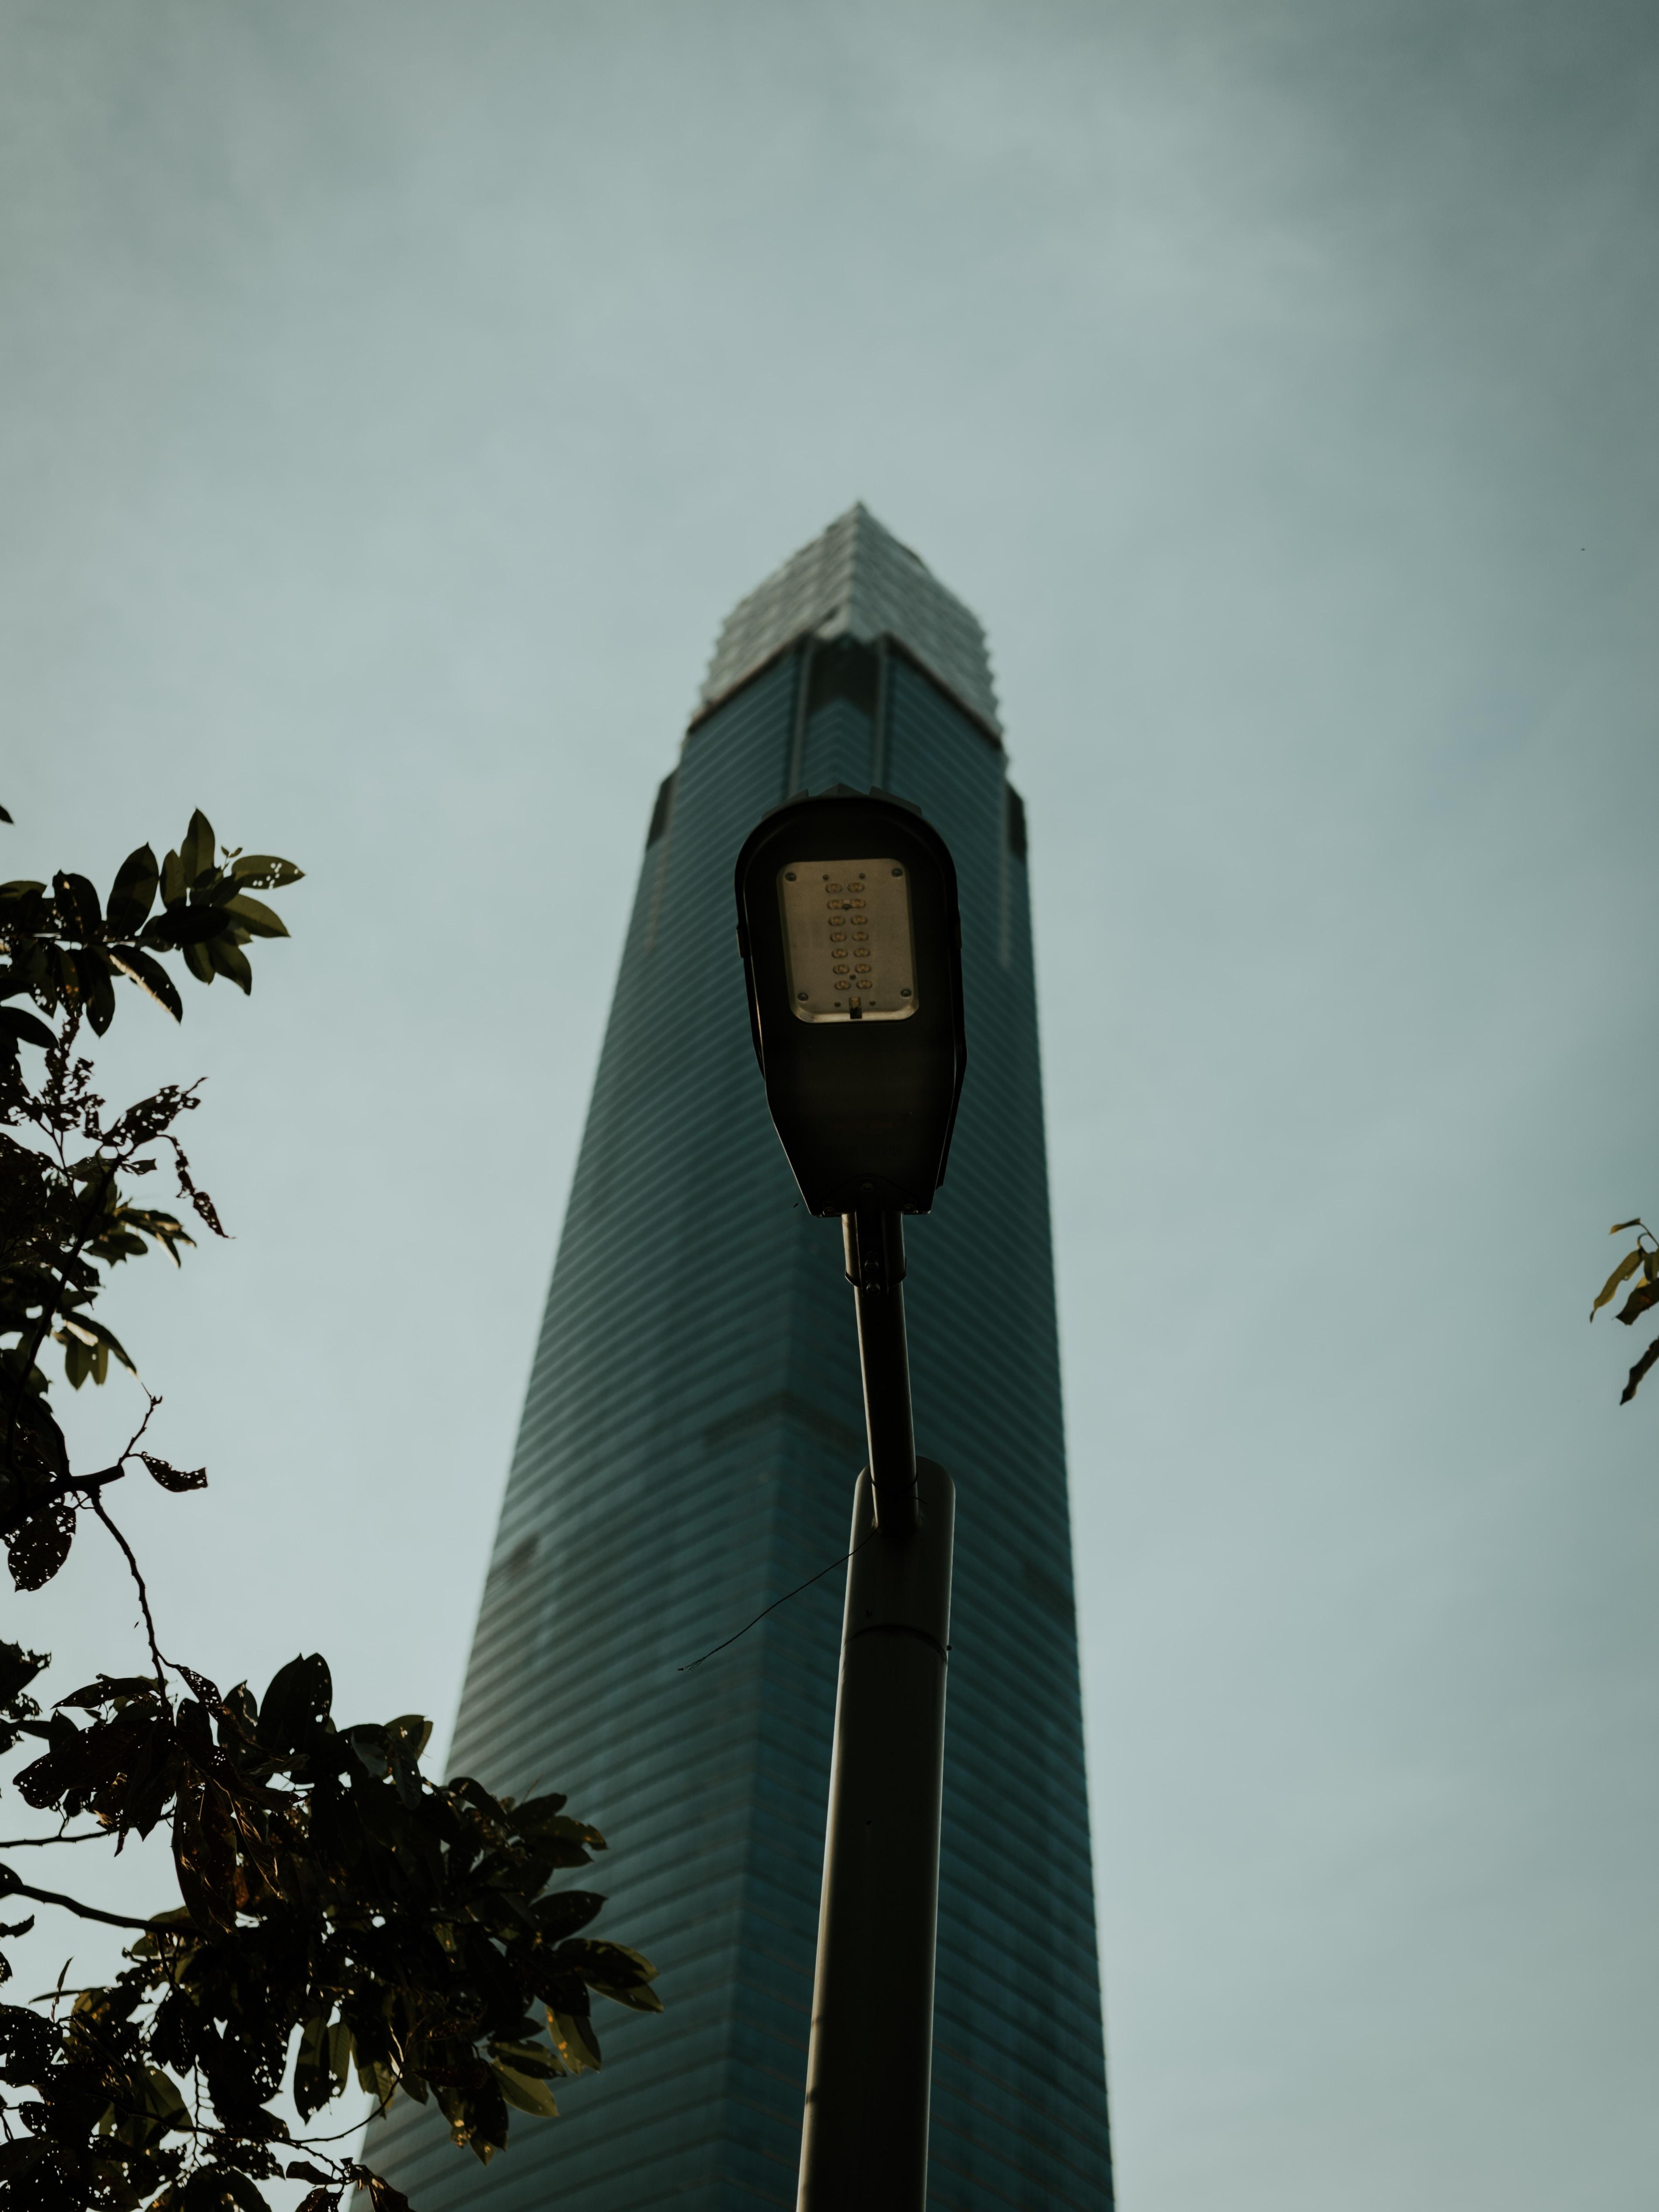 black light post near building